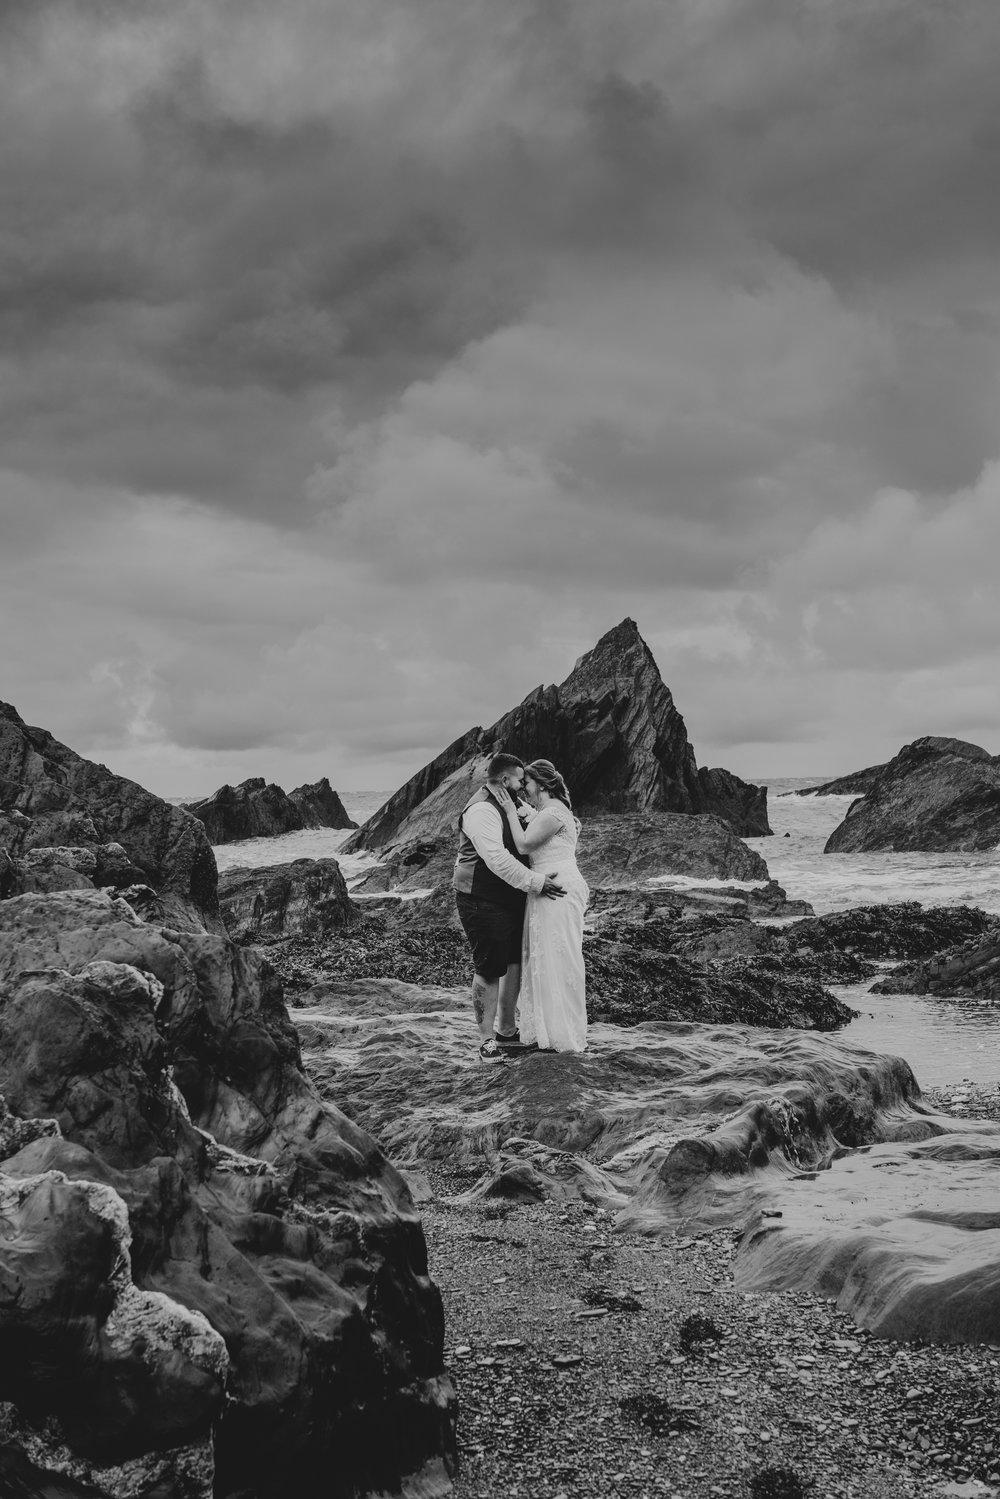 john-amy-relaxed-beach-wedding-tunnels-beaches-ilfracombe-north-devon-grace-elizabeth-colchester-essex-alternative-relaxed-wedding-photography-devon-suffolk-norfolk-essex (139 of 159).jpg